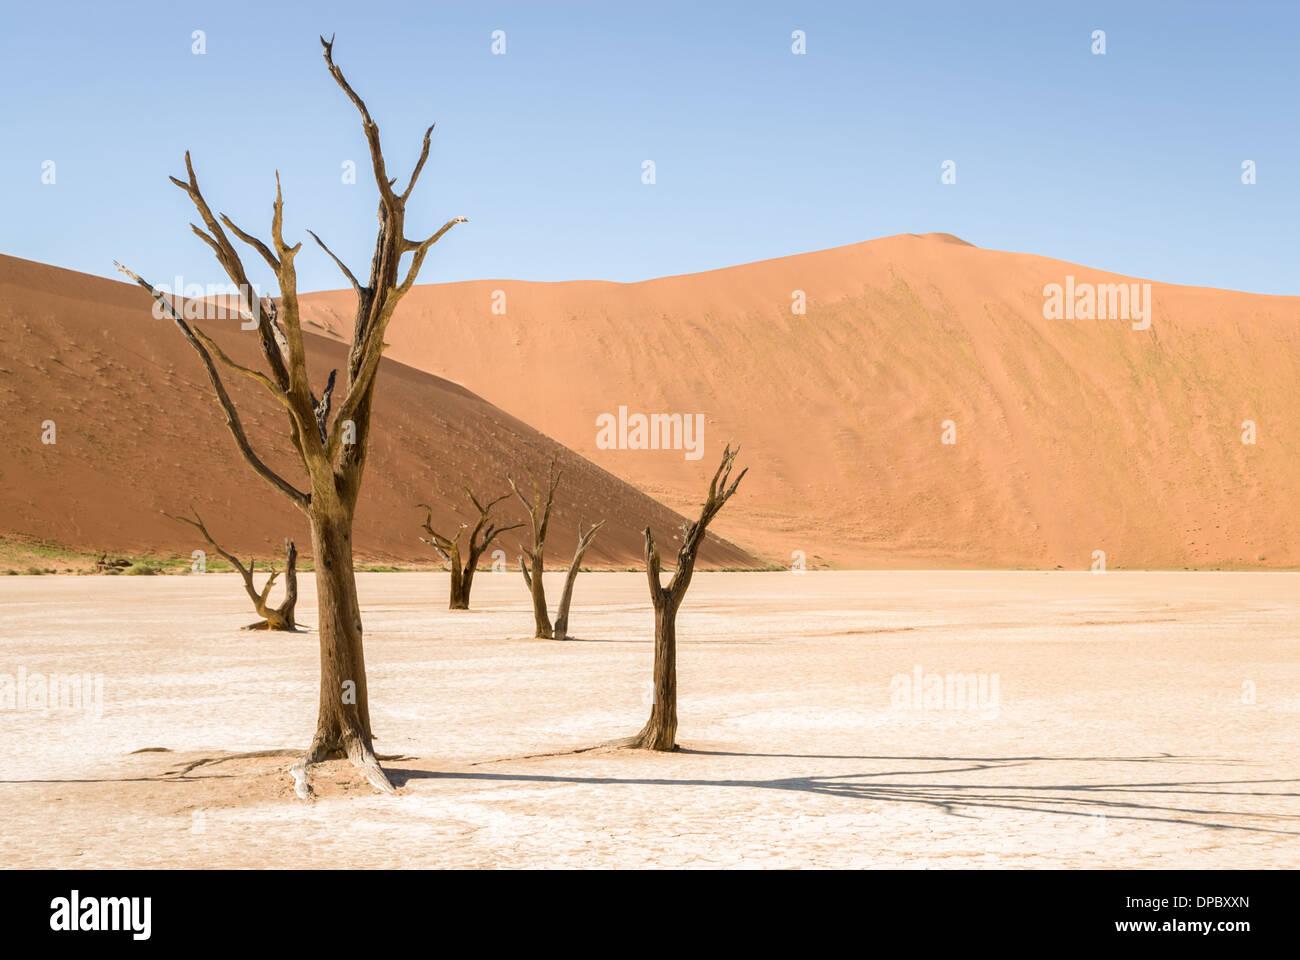 Dead trees of the Dead Vlei , Namib  Naukluft National Park, Sossusvlei, Namibia, Africa. - Stock Image